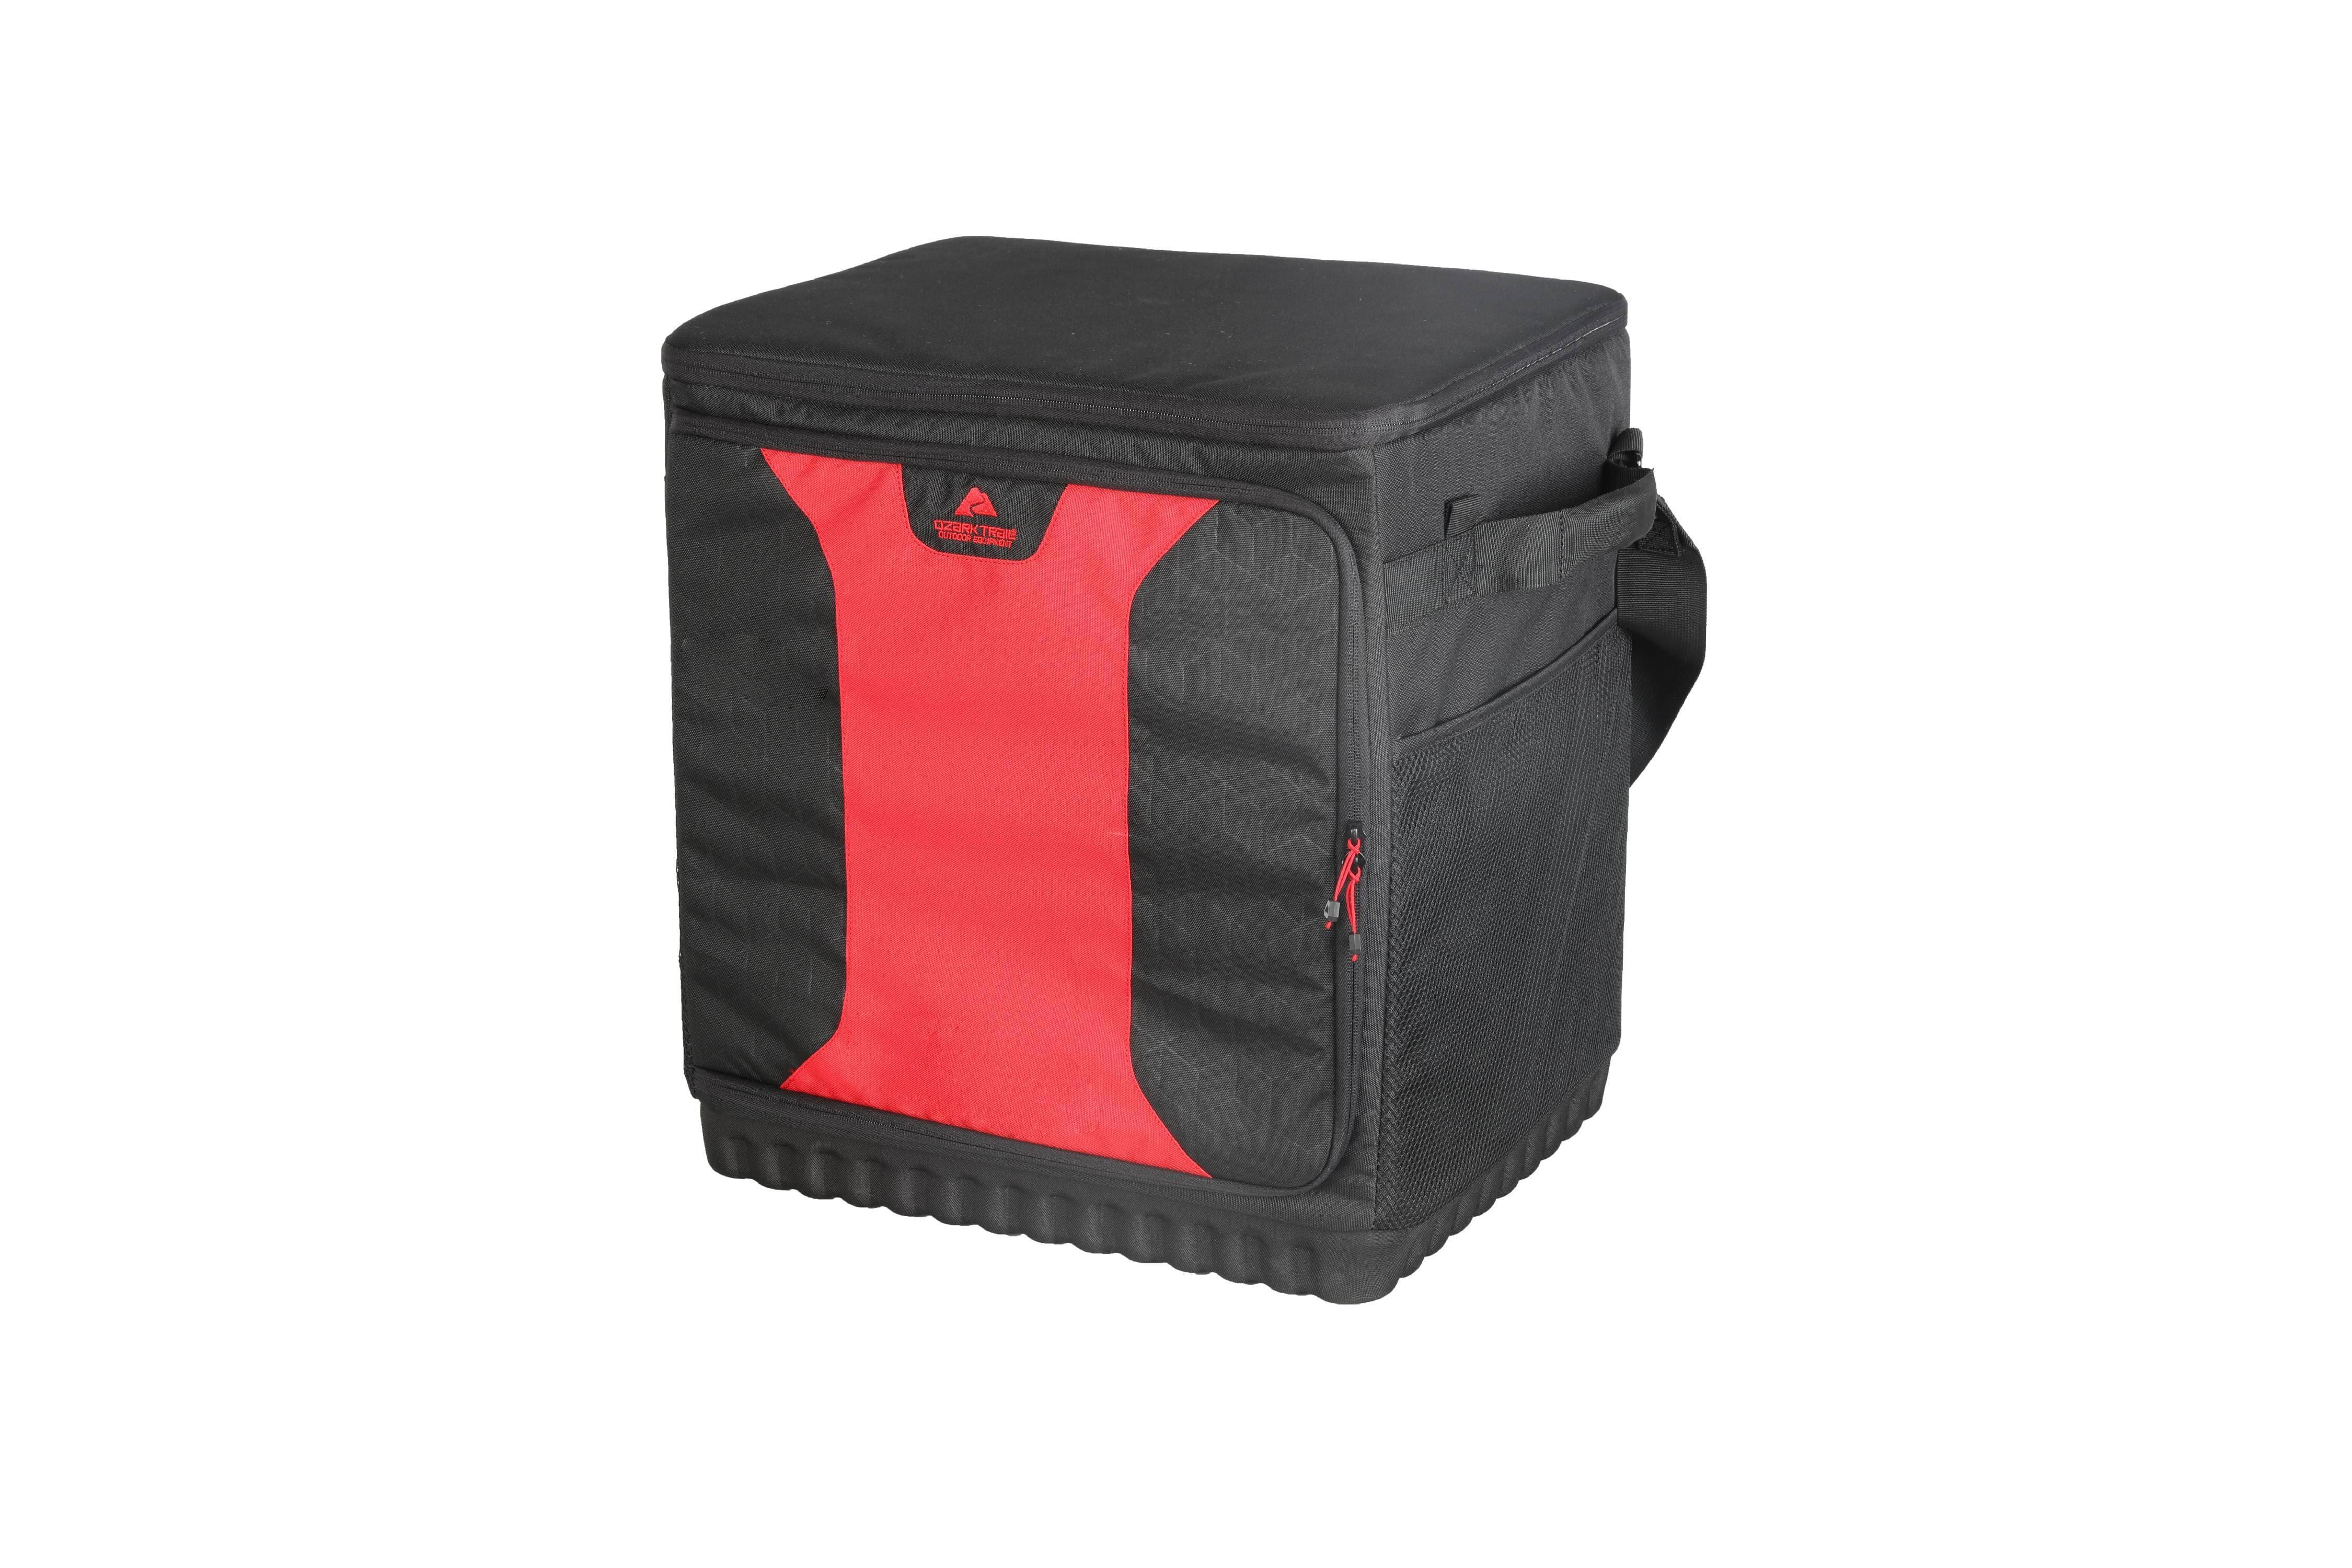 Ozark Trail Crane Lake Deluxe Camp Storage Organizer (Red/Black or Camo) $30 at Walmart w/ Free S&H on $35+